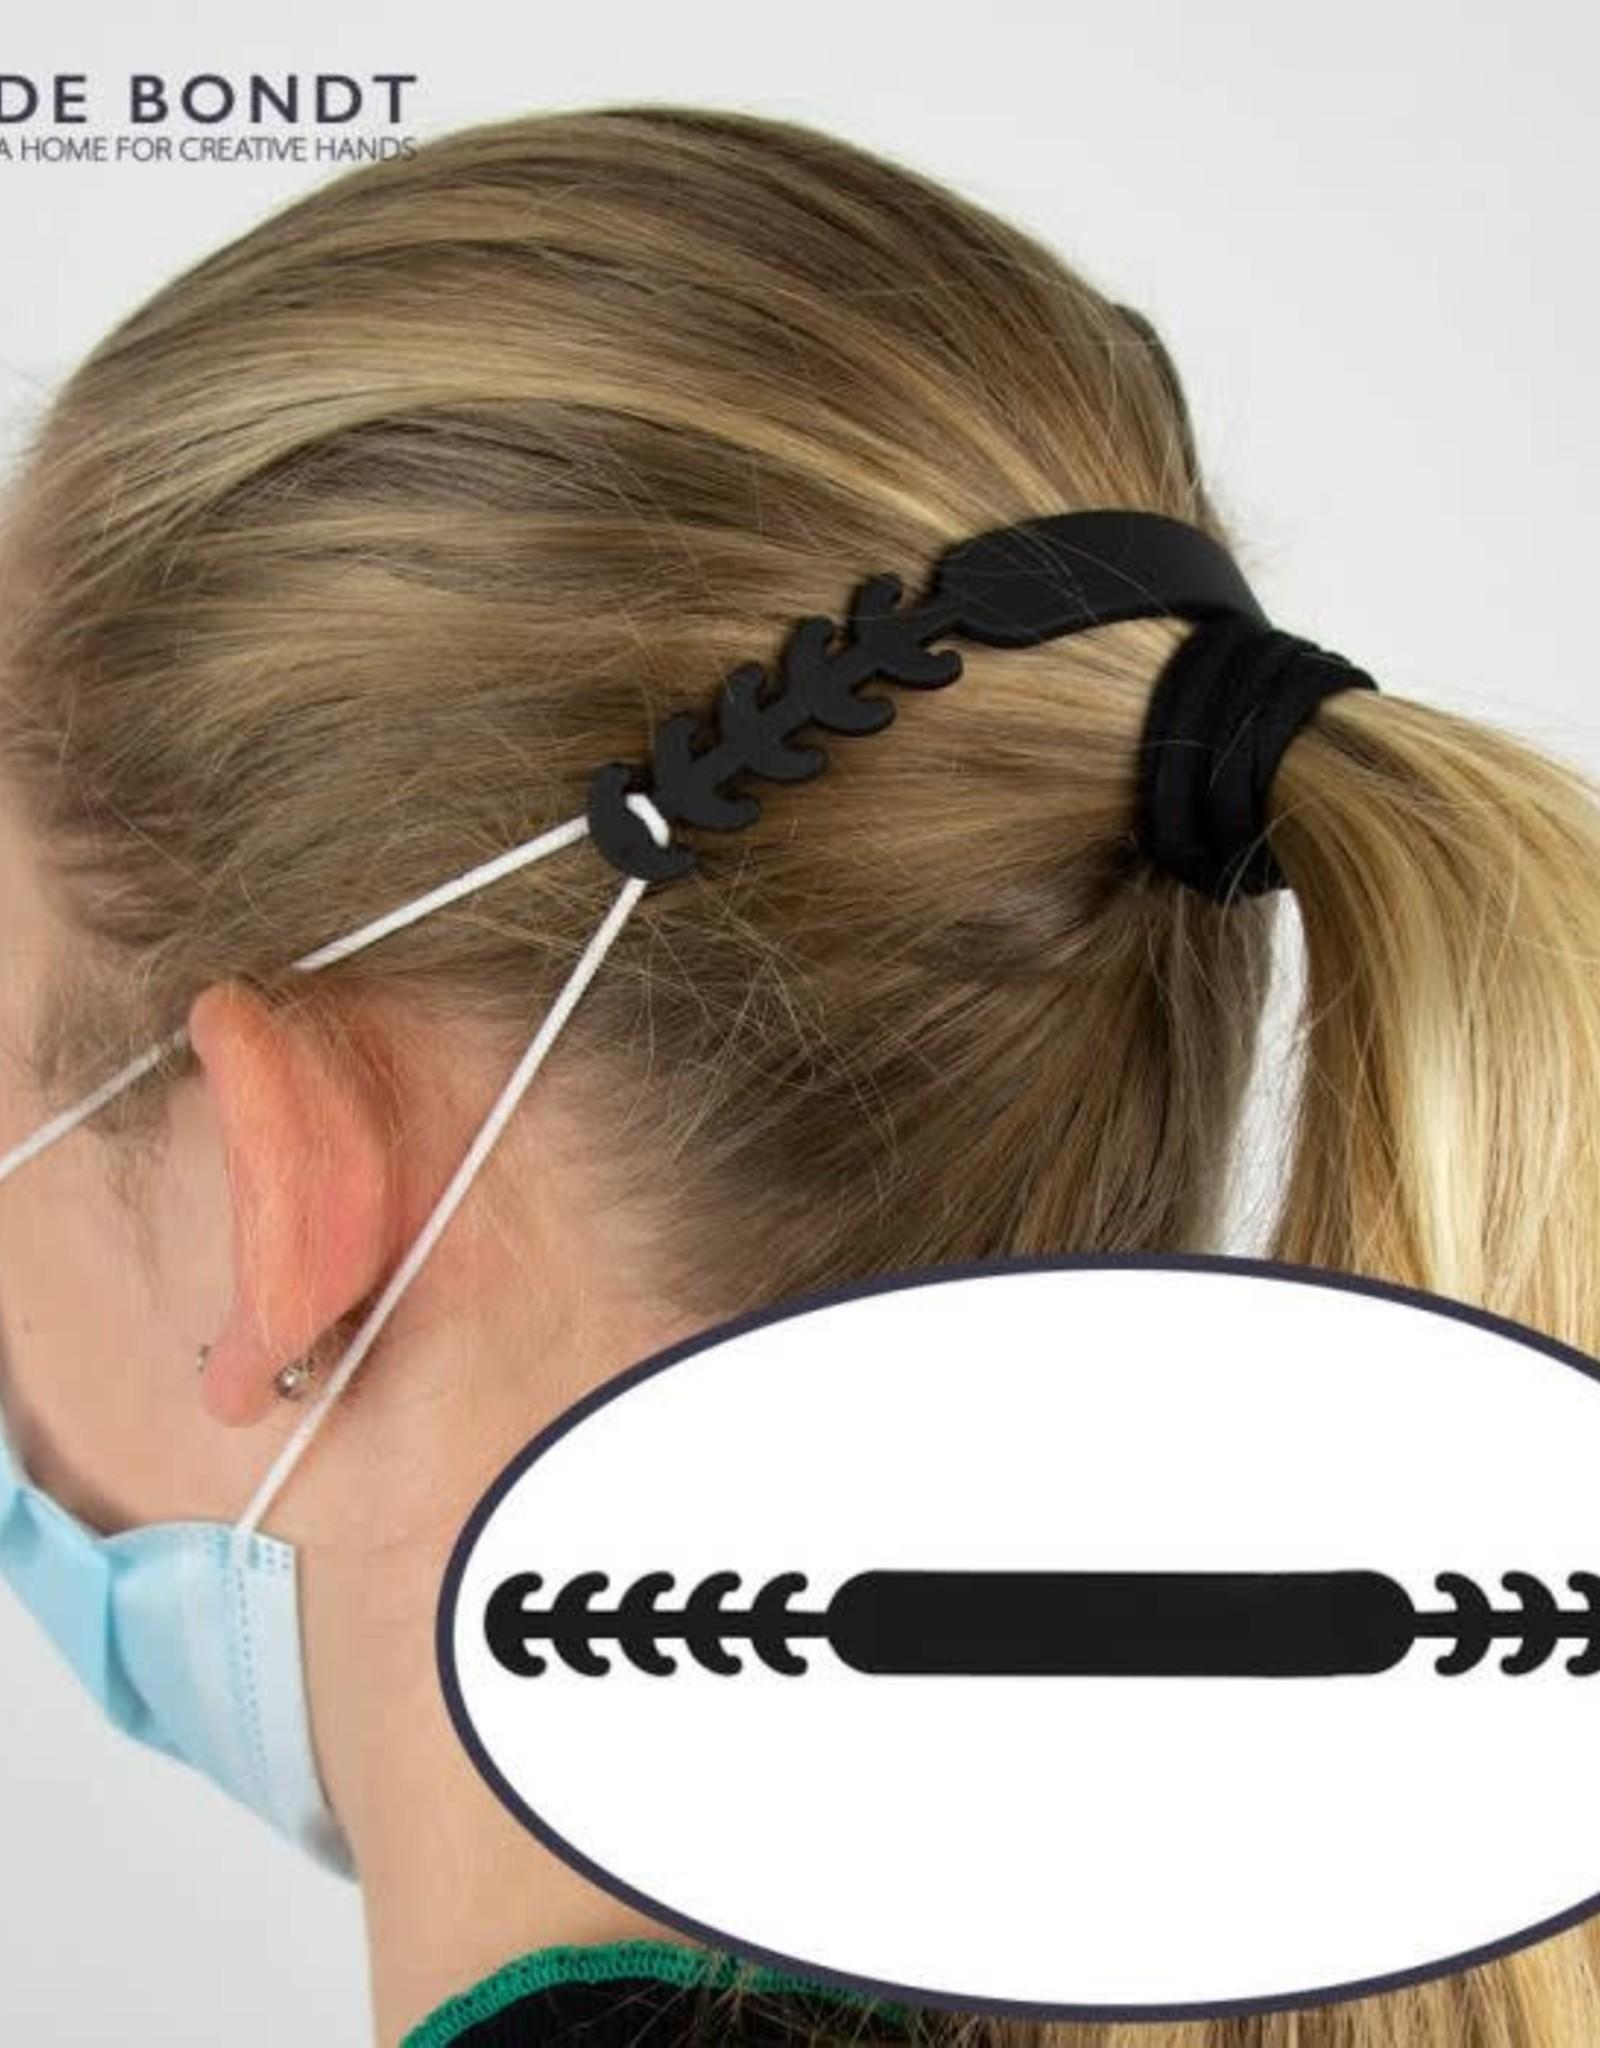 Siliconen oorbeschermers mondmasker transparant